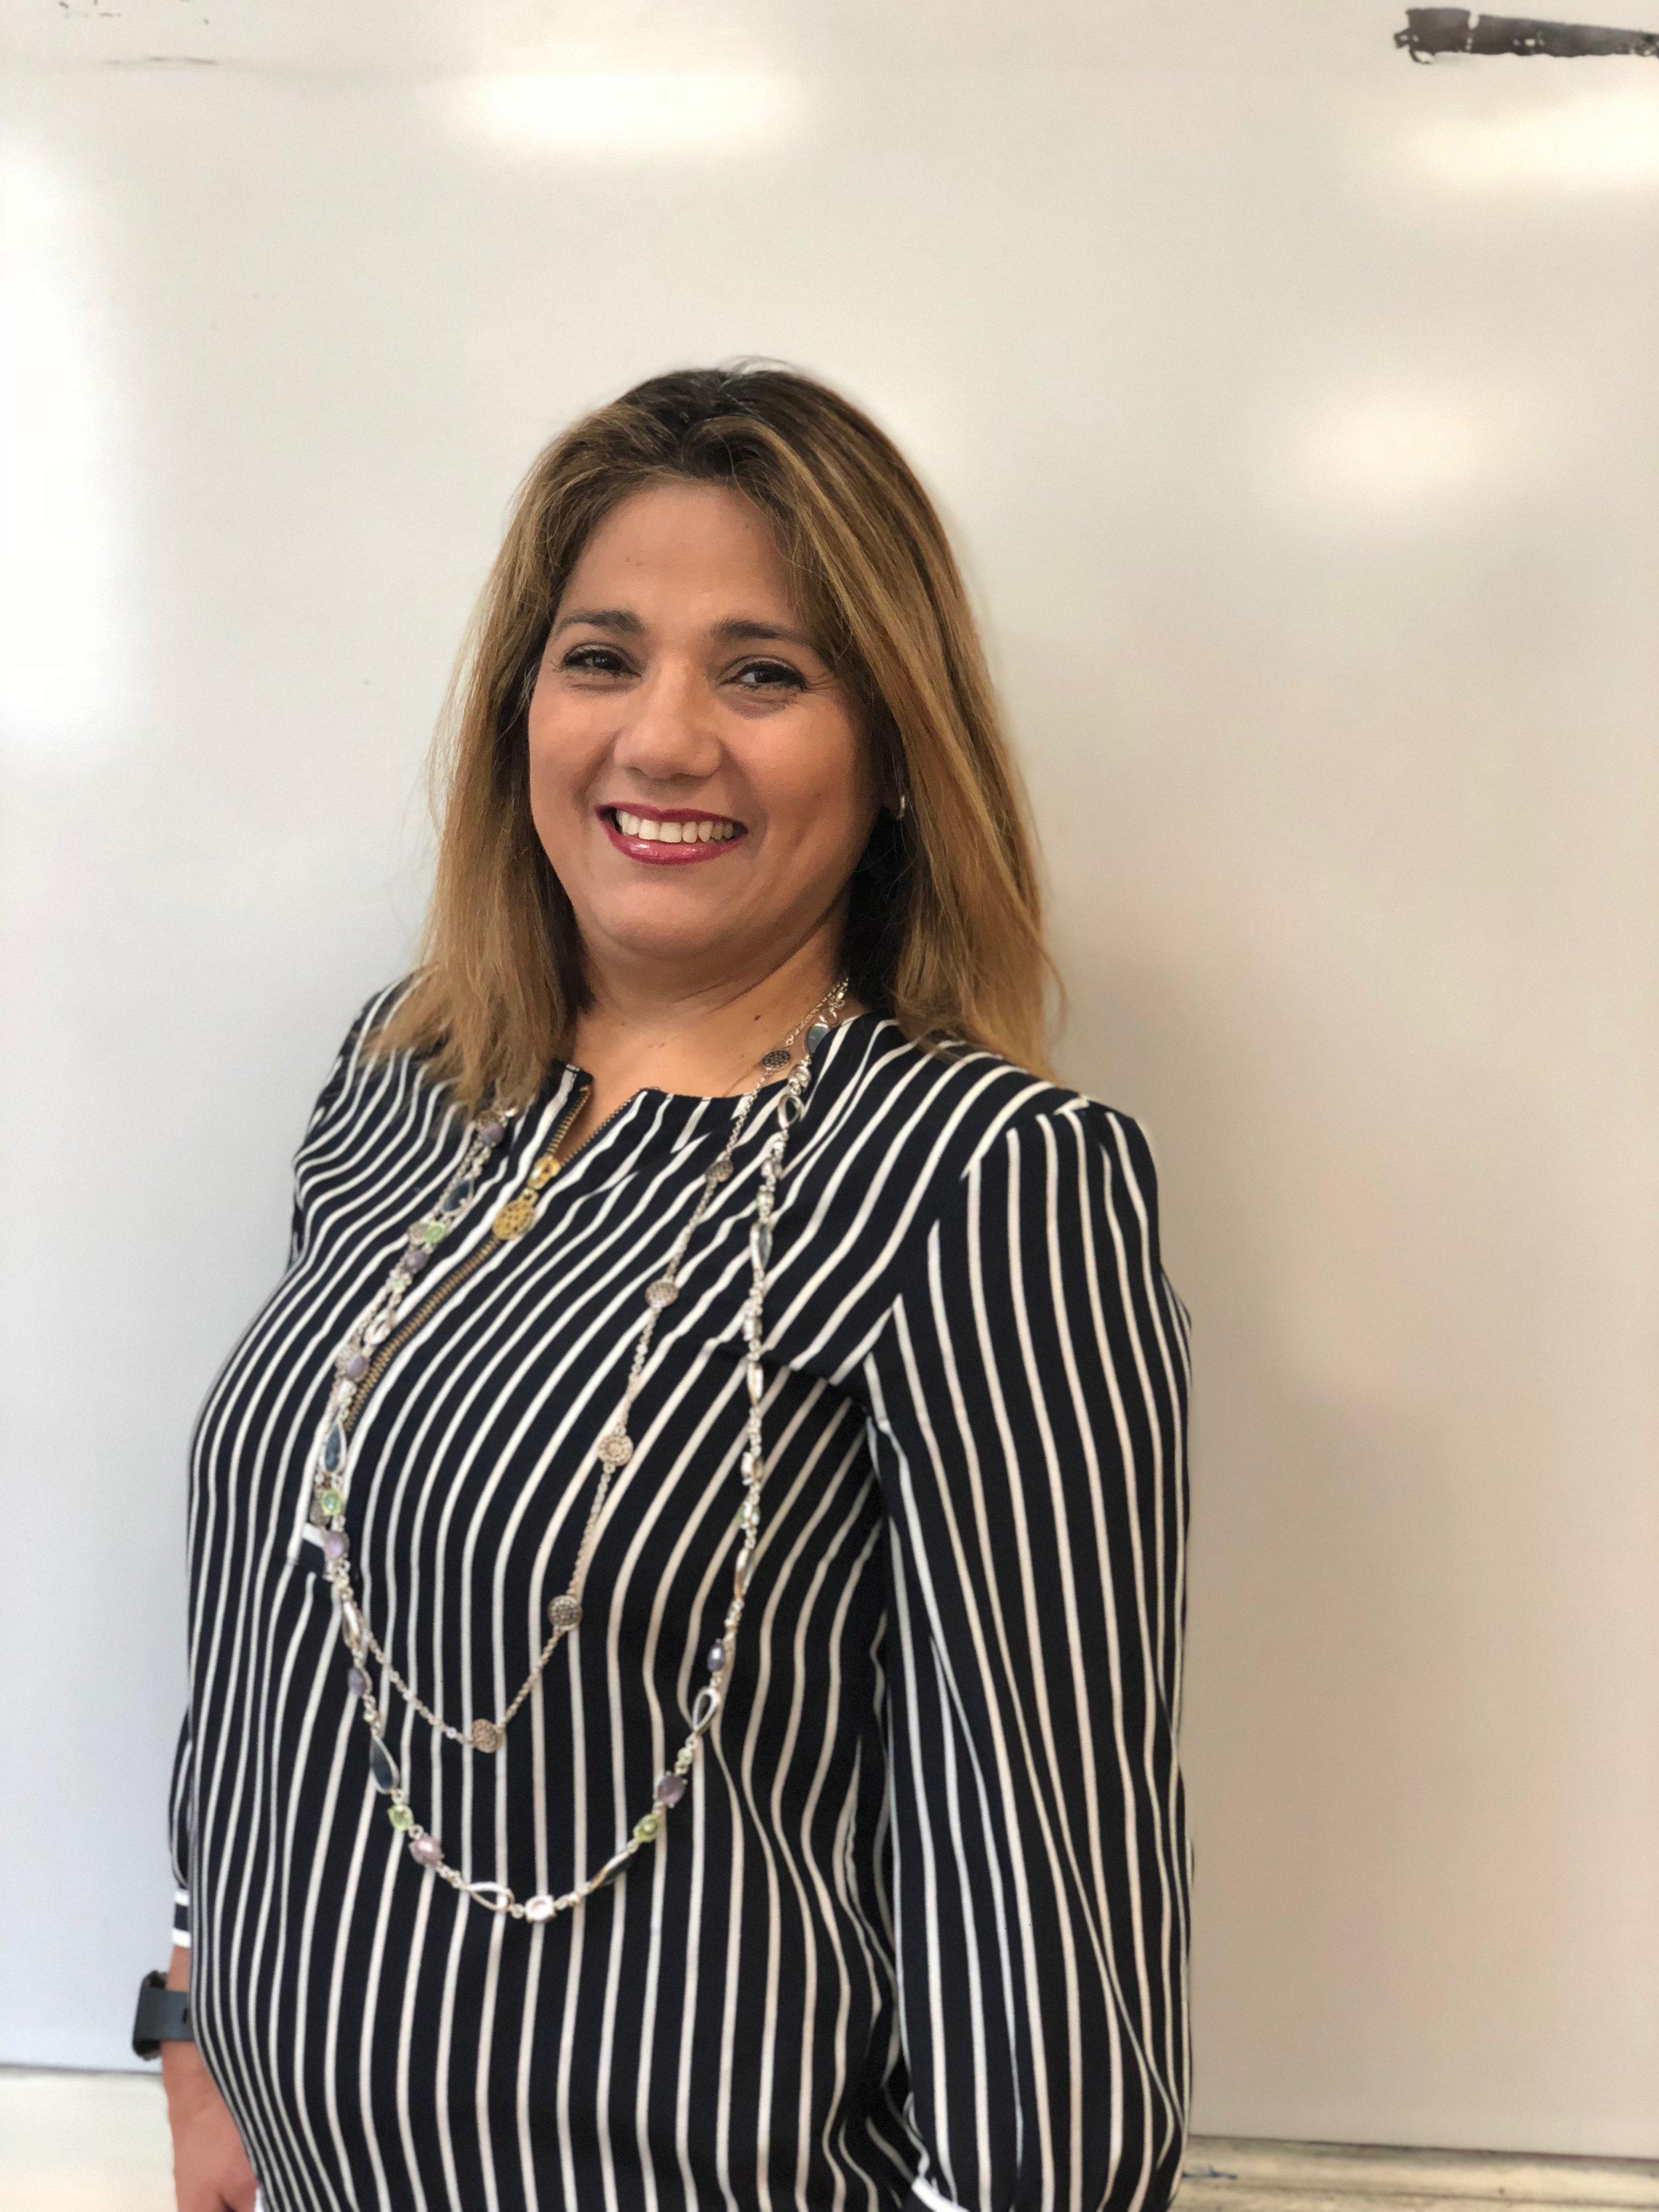 Ursula Lalone  Regional Director, Central & Southeast Region